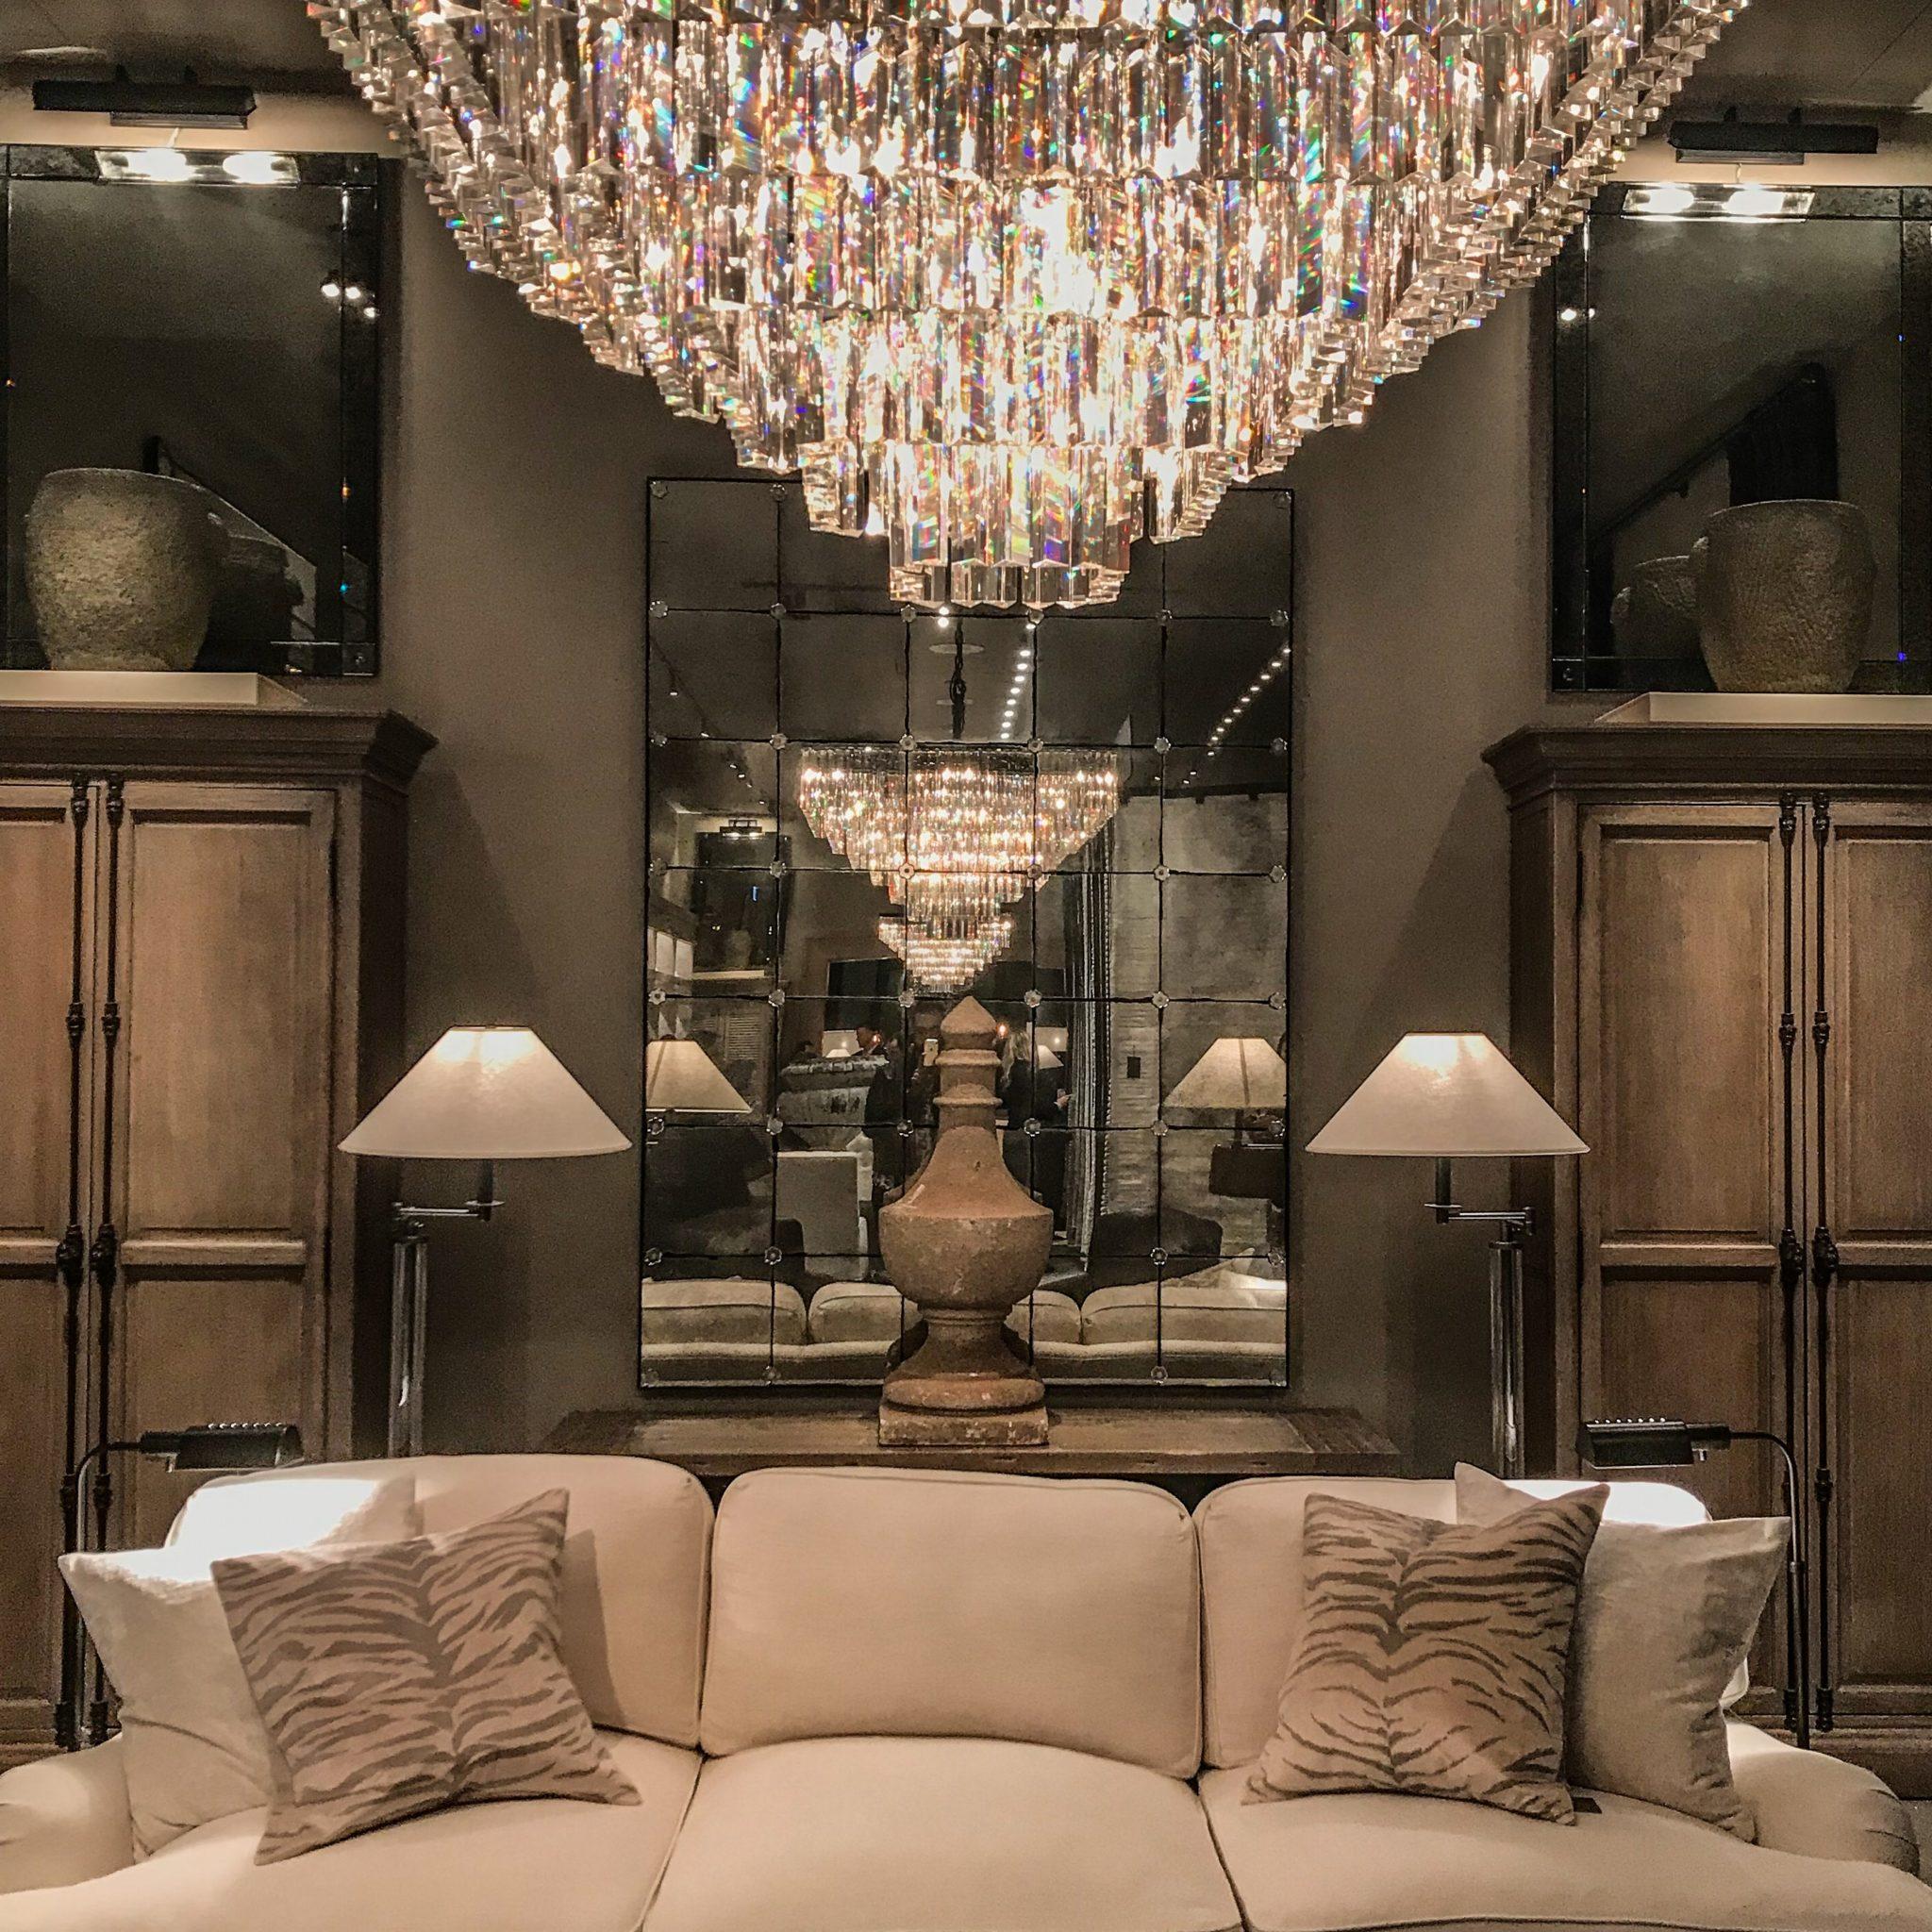 Restoration RH Furniture - Living Room